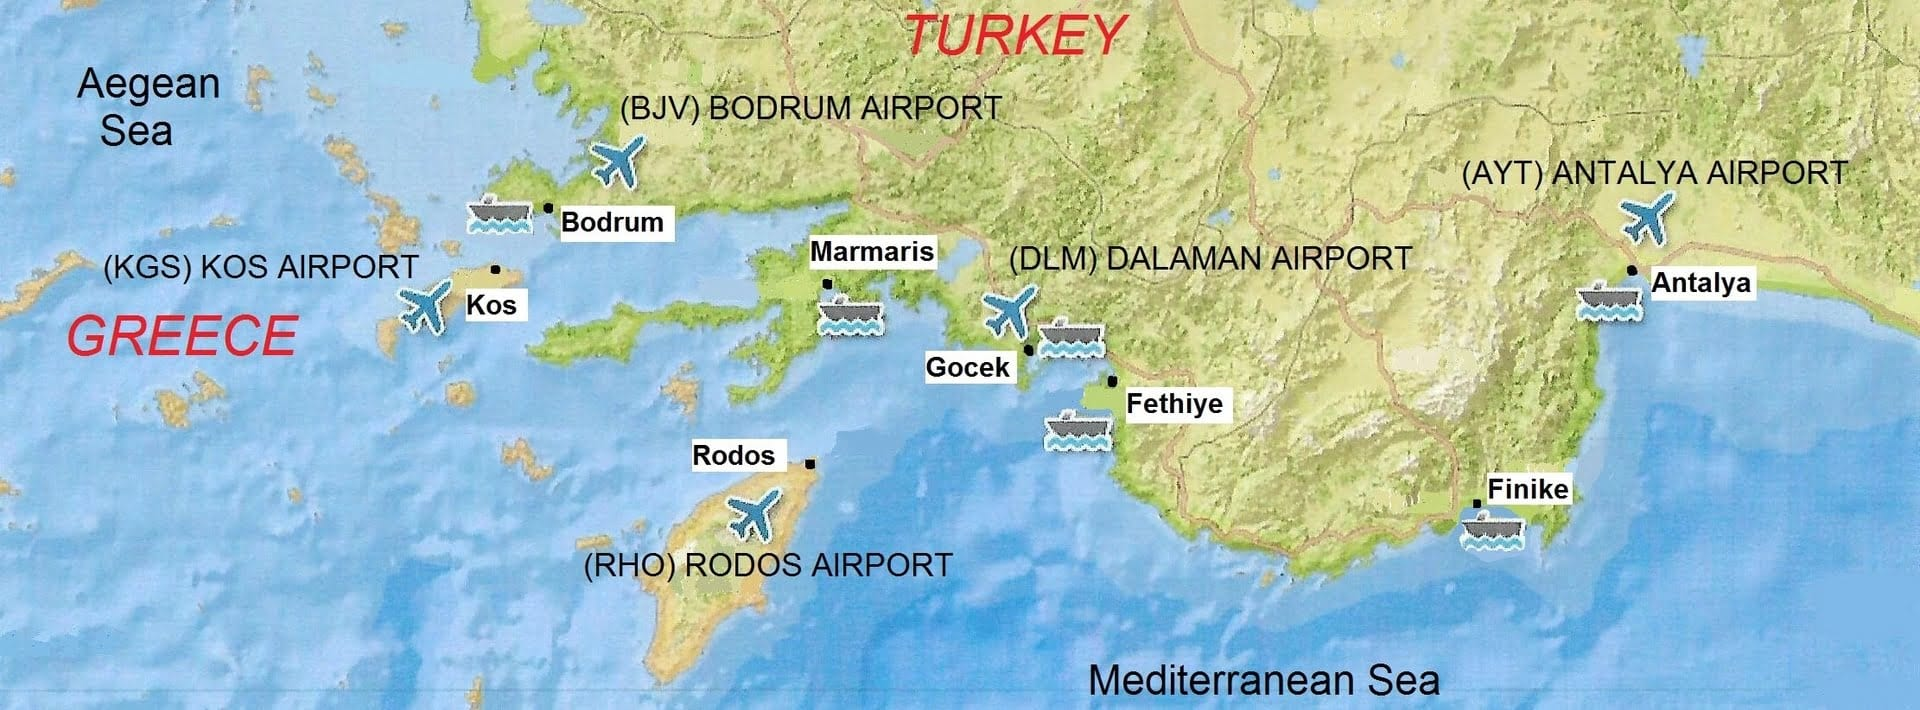 круиз на моторной яхте по Турции